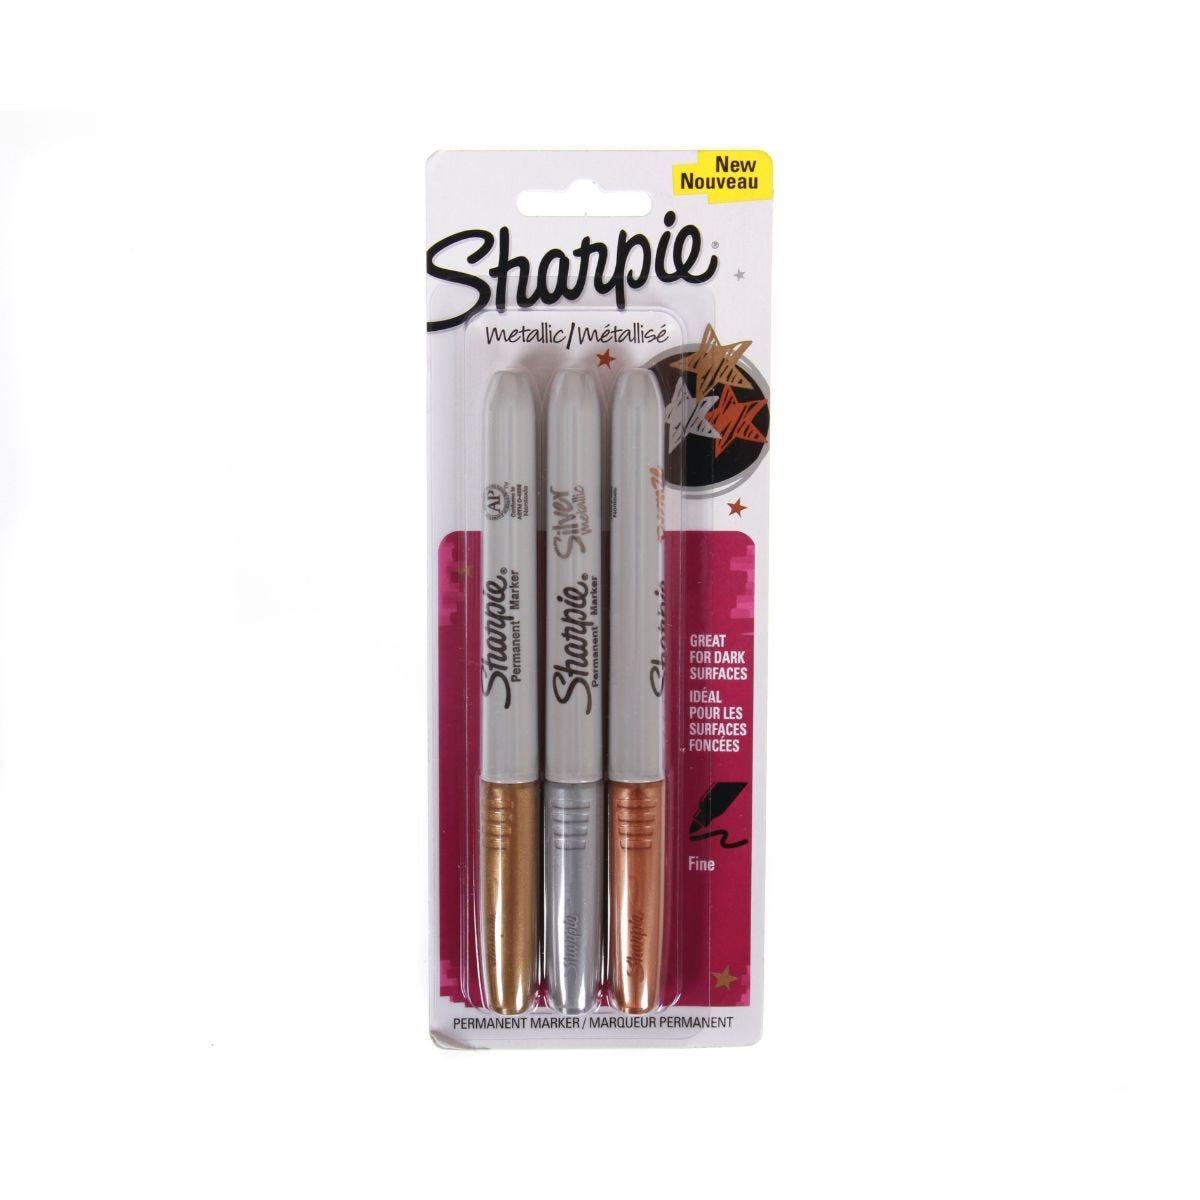 Sharpie Metallic Permanent Marker Pack of 3